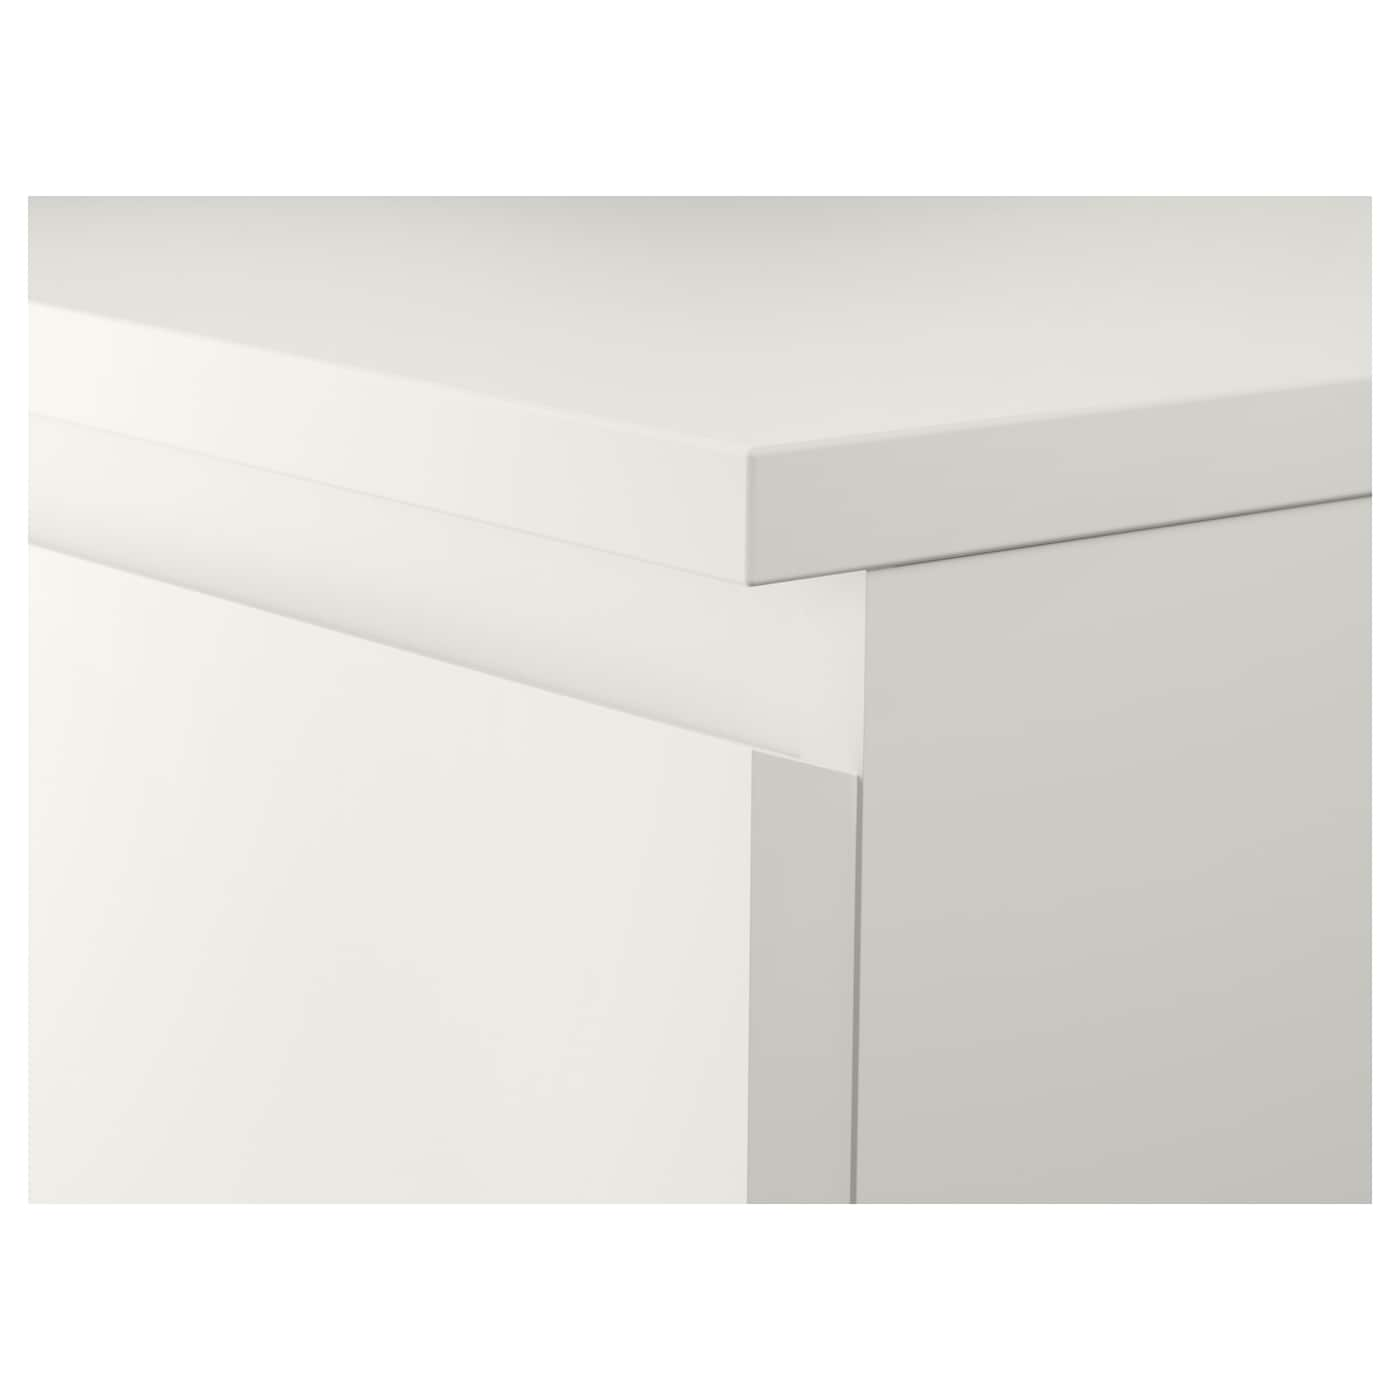 MALM chest of 3 drawers white 80 cm 48 cm 78 cm 72 cm 43 cm